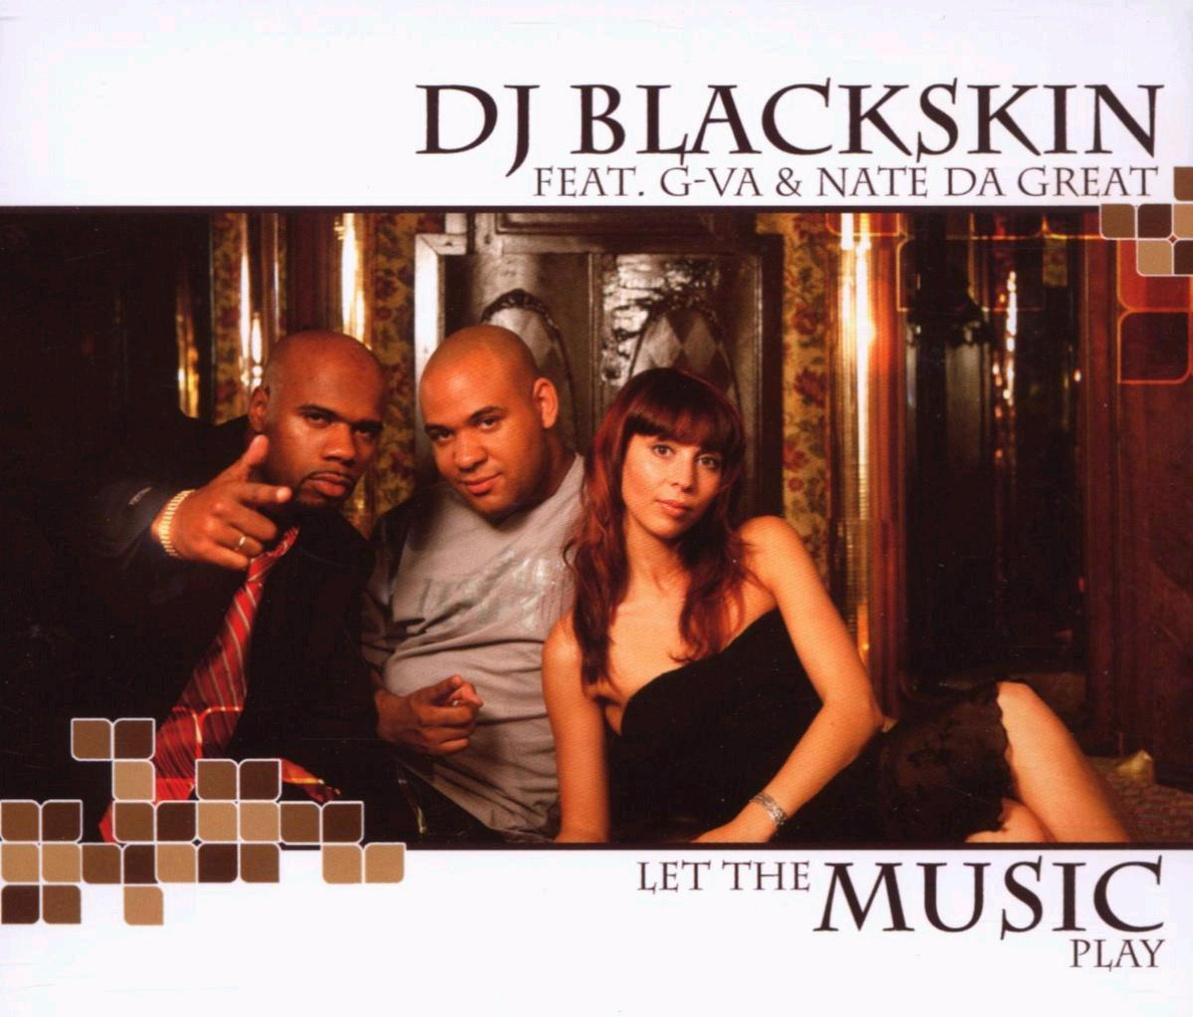 DJ Blackskin - Let the Music Play